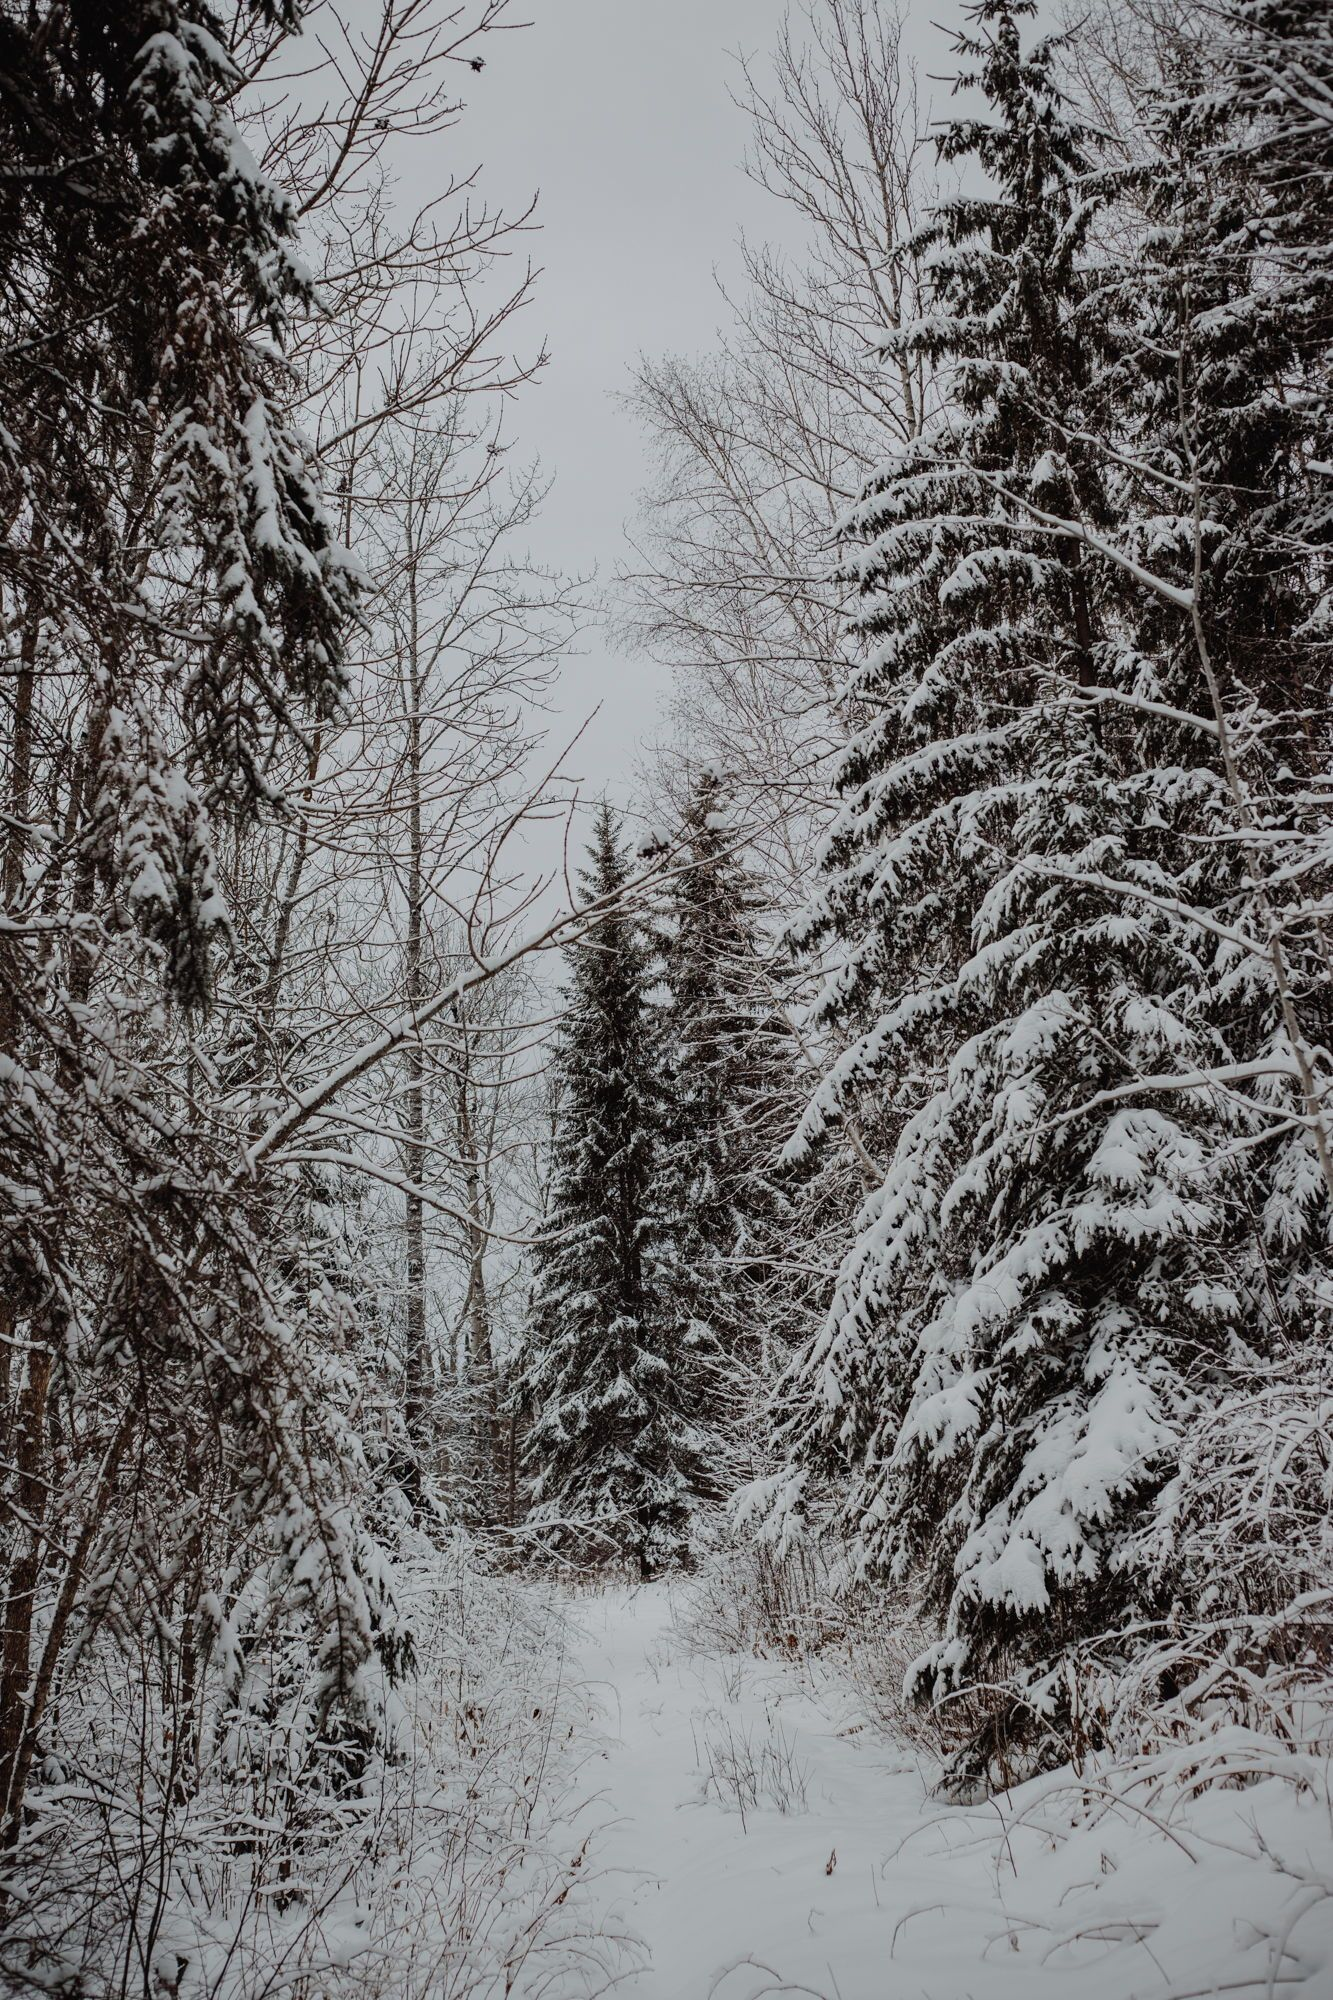 Зима, холод в картинках  52e0cdc865dfde64635961cf7cb9ef3c